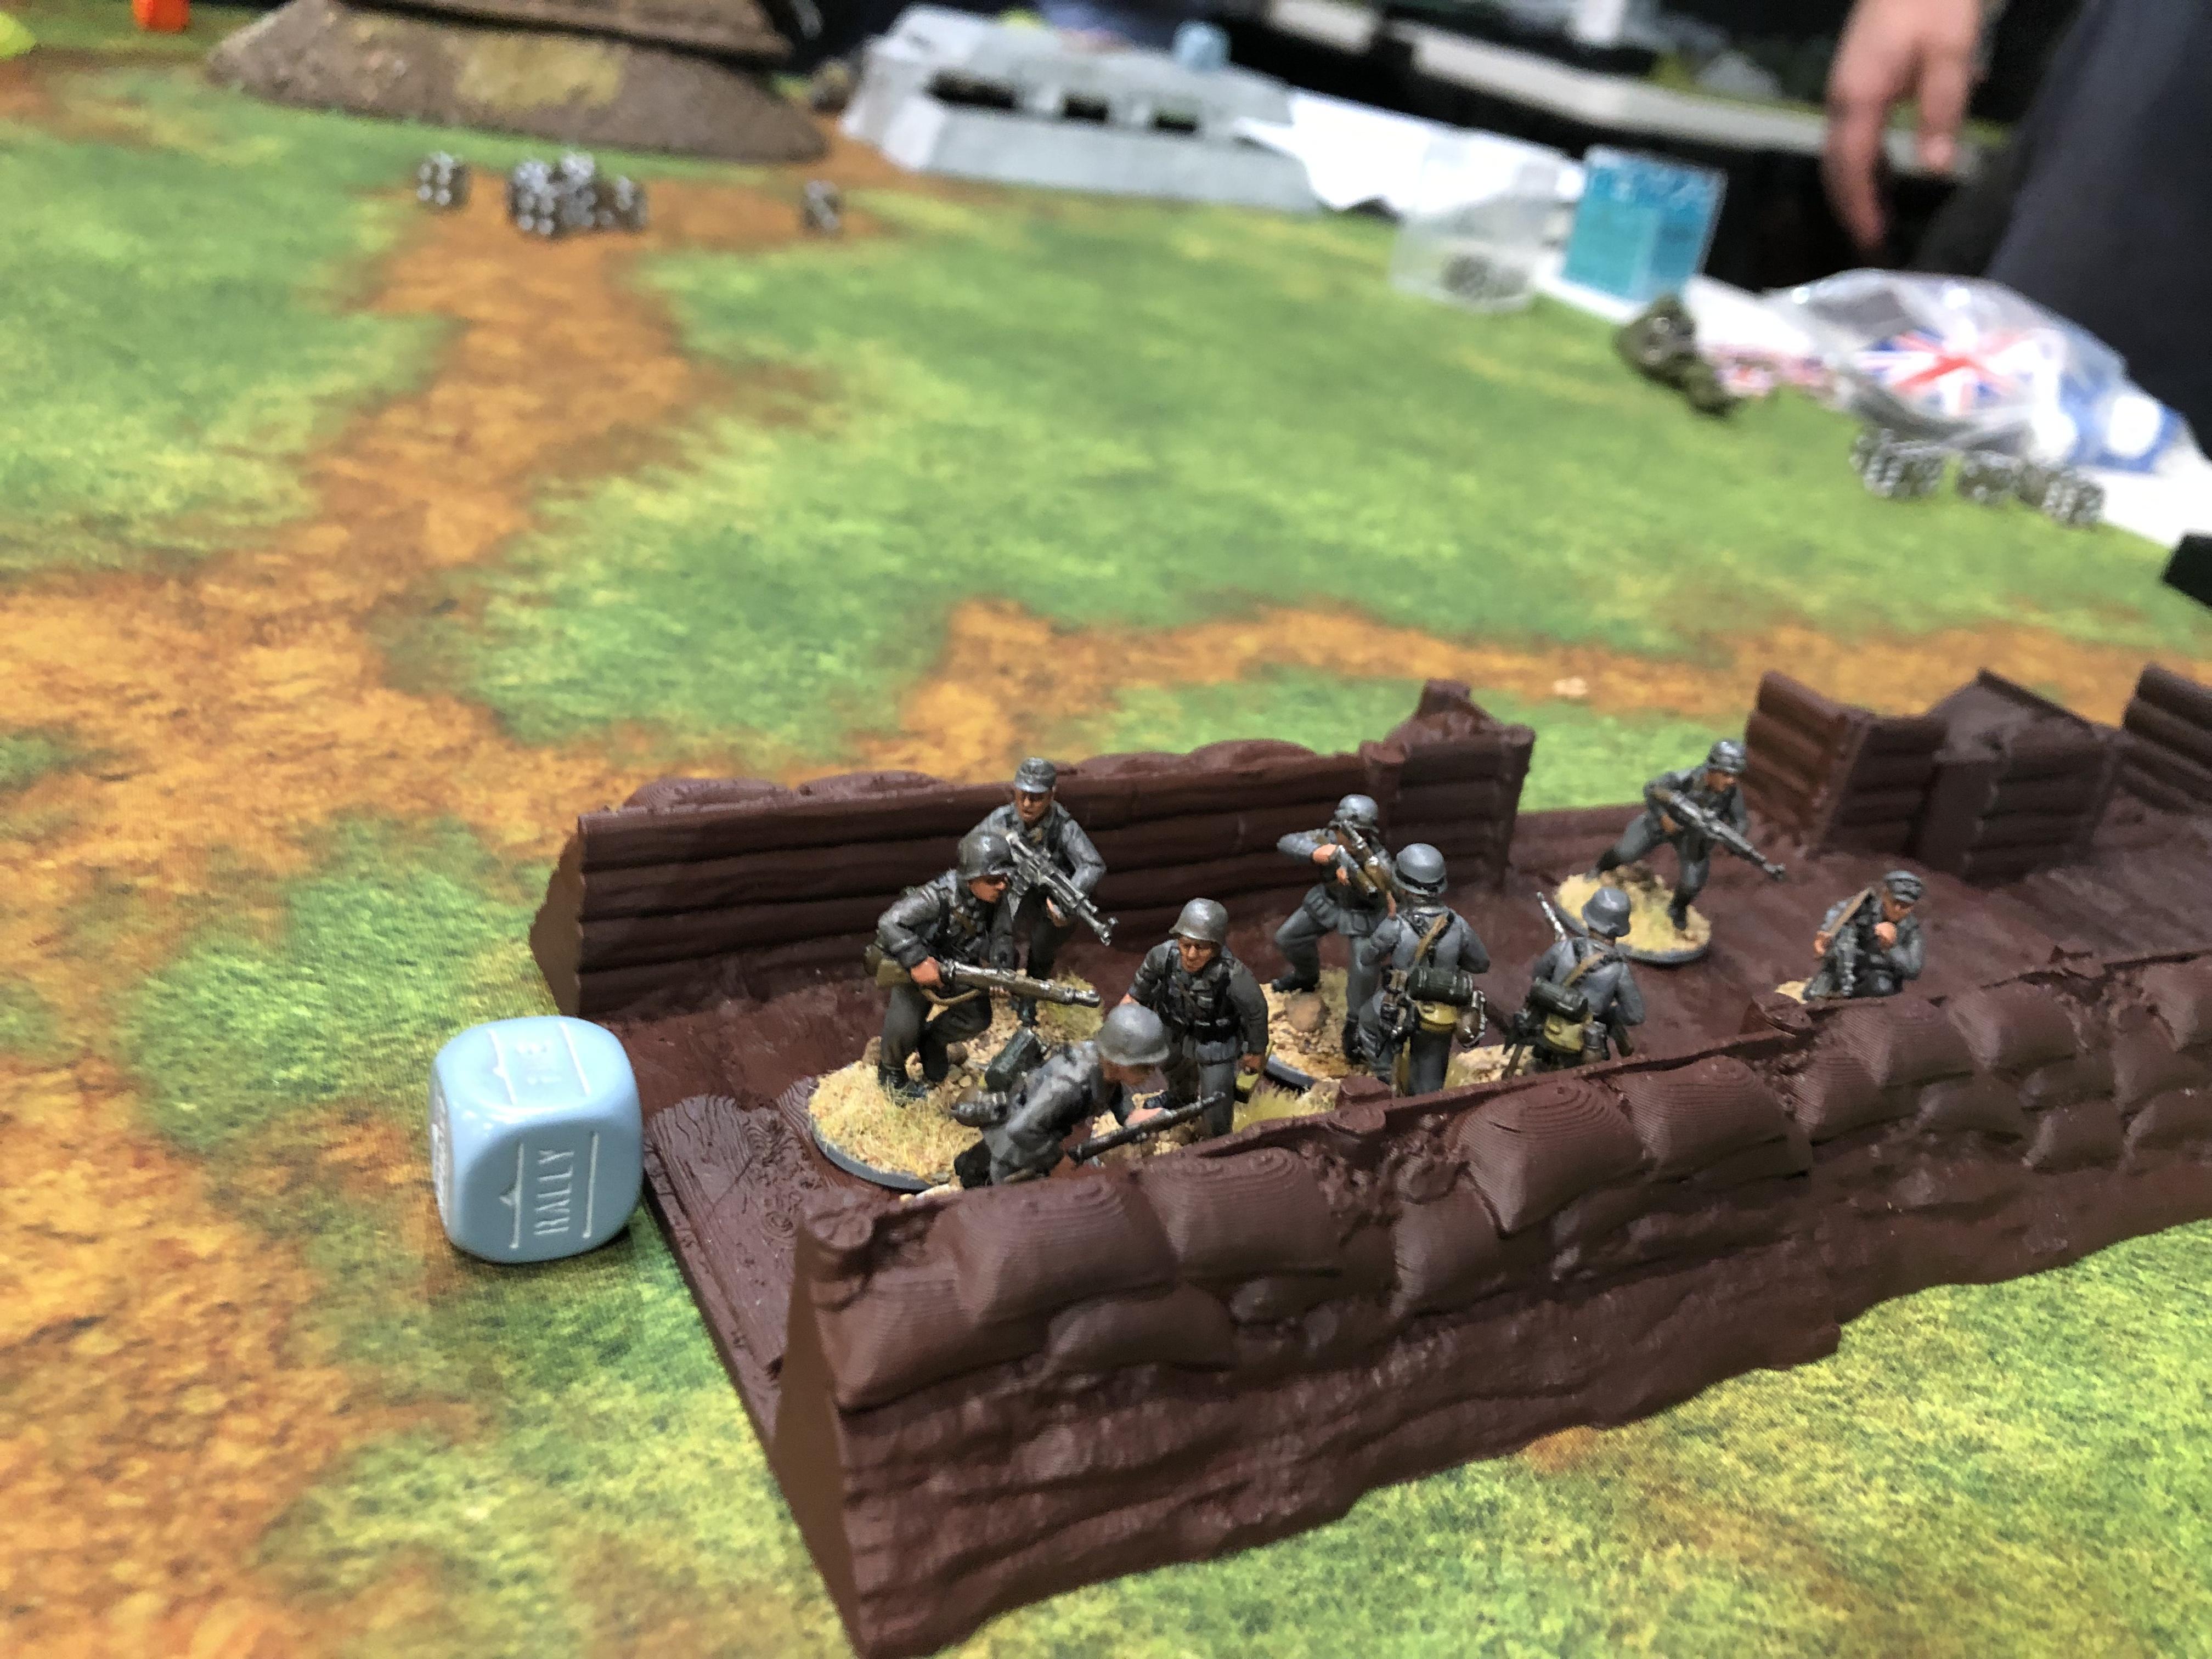 Pavlov's Dogs versus Herman's Germans in a fierce infantry engagement